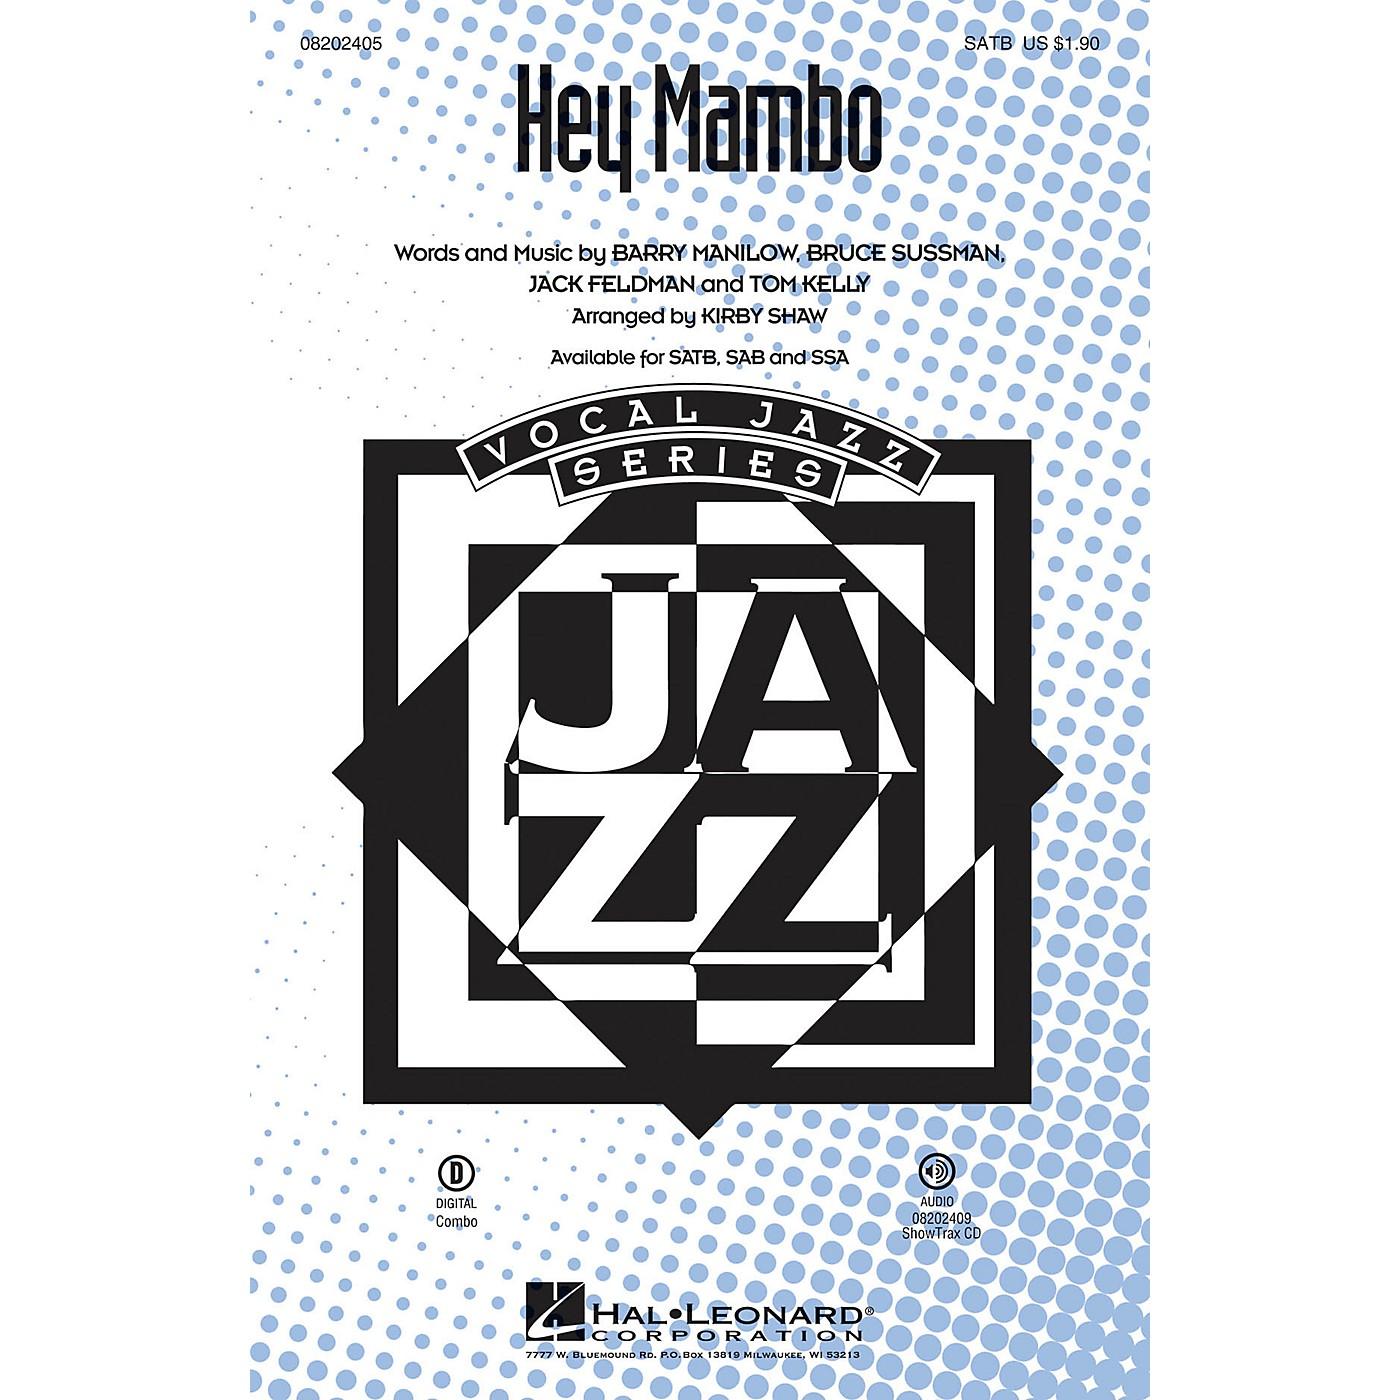 Hal Leonard Hey Mambo ShowTrax CD by Barry Manilow Arranged by Kirby Shaw thumbnail